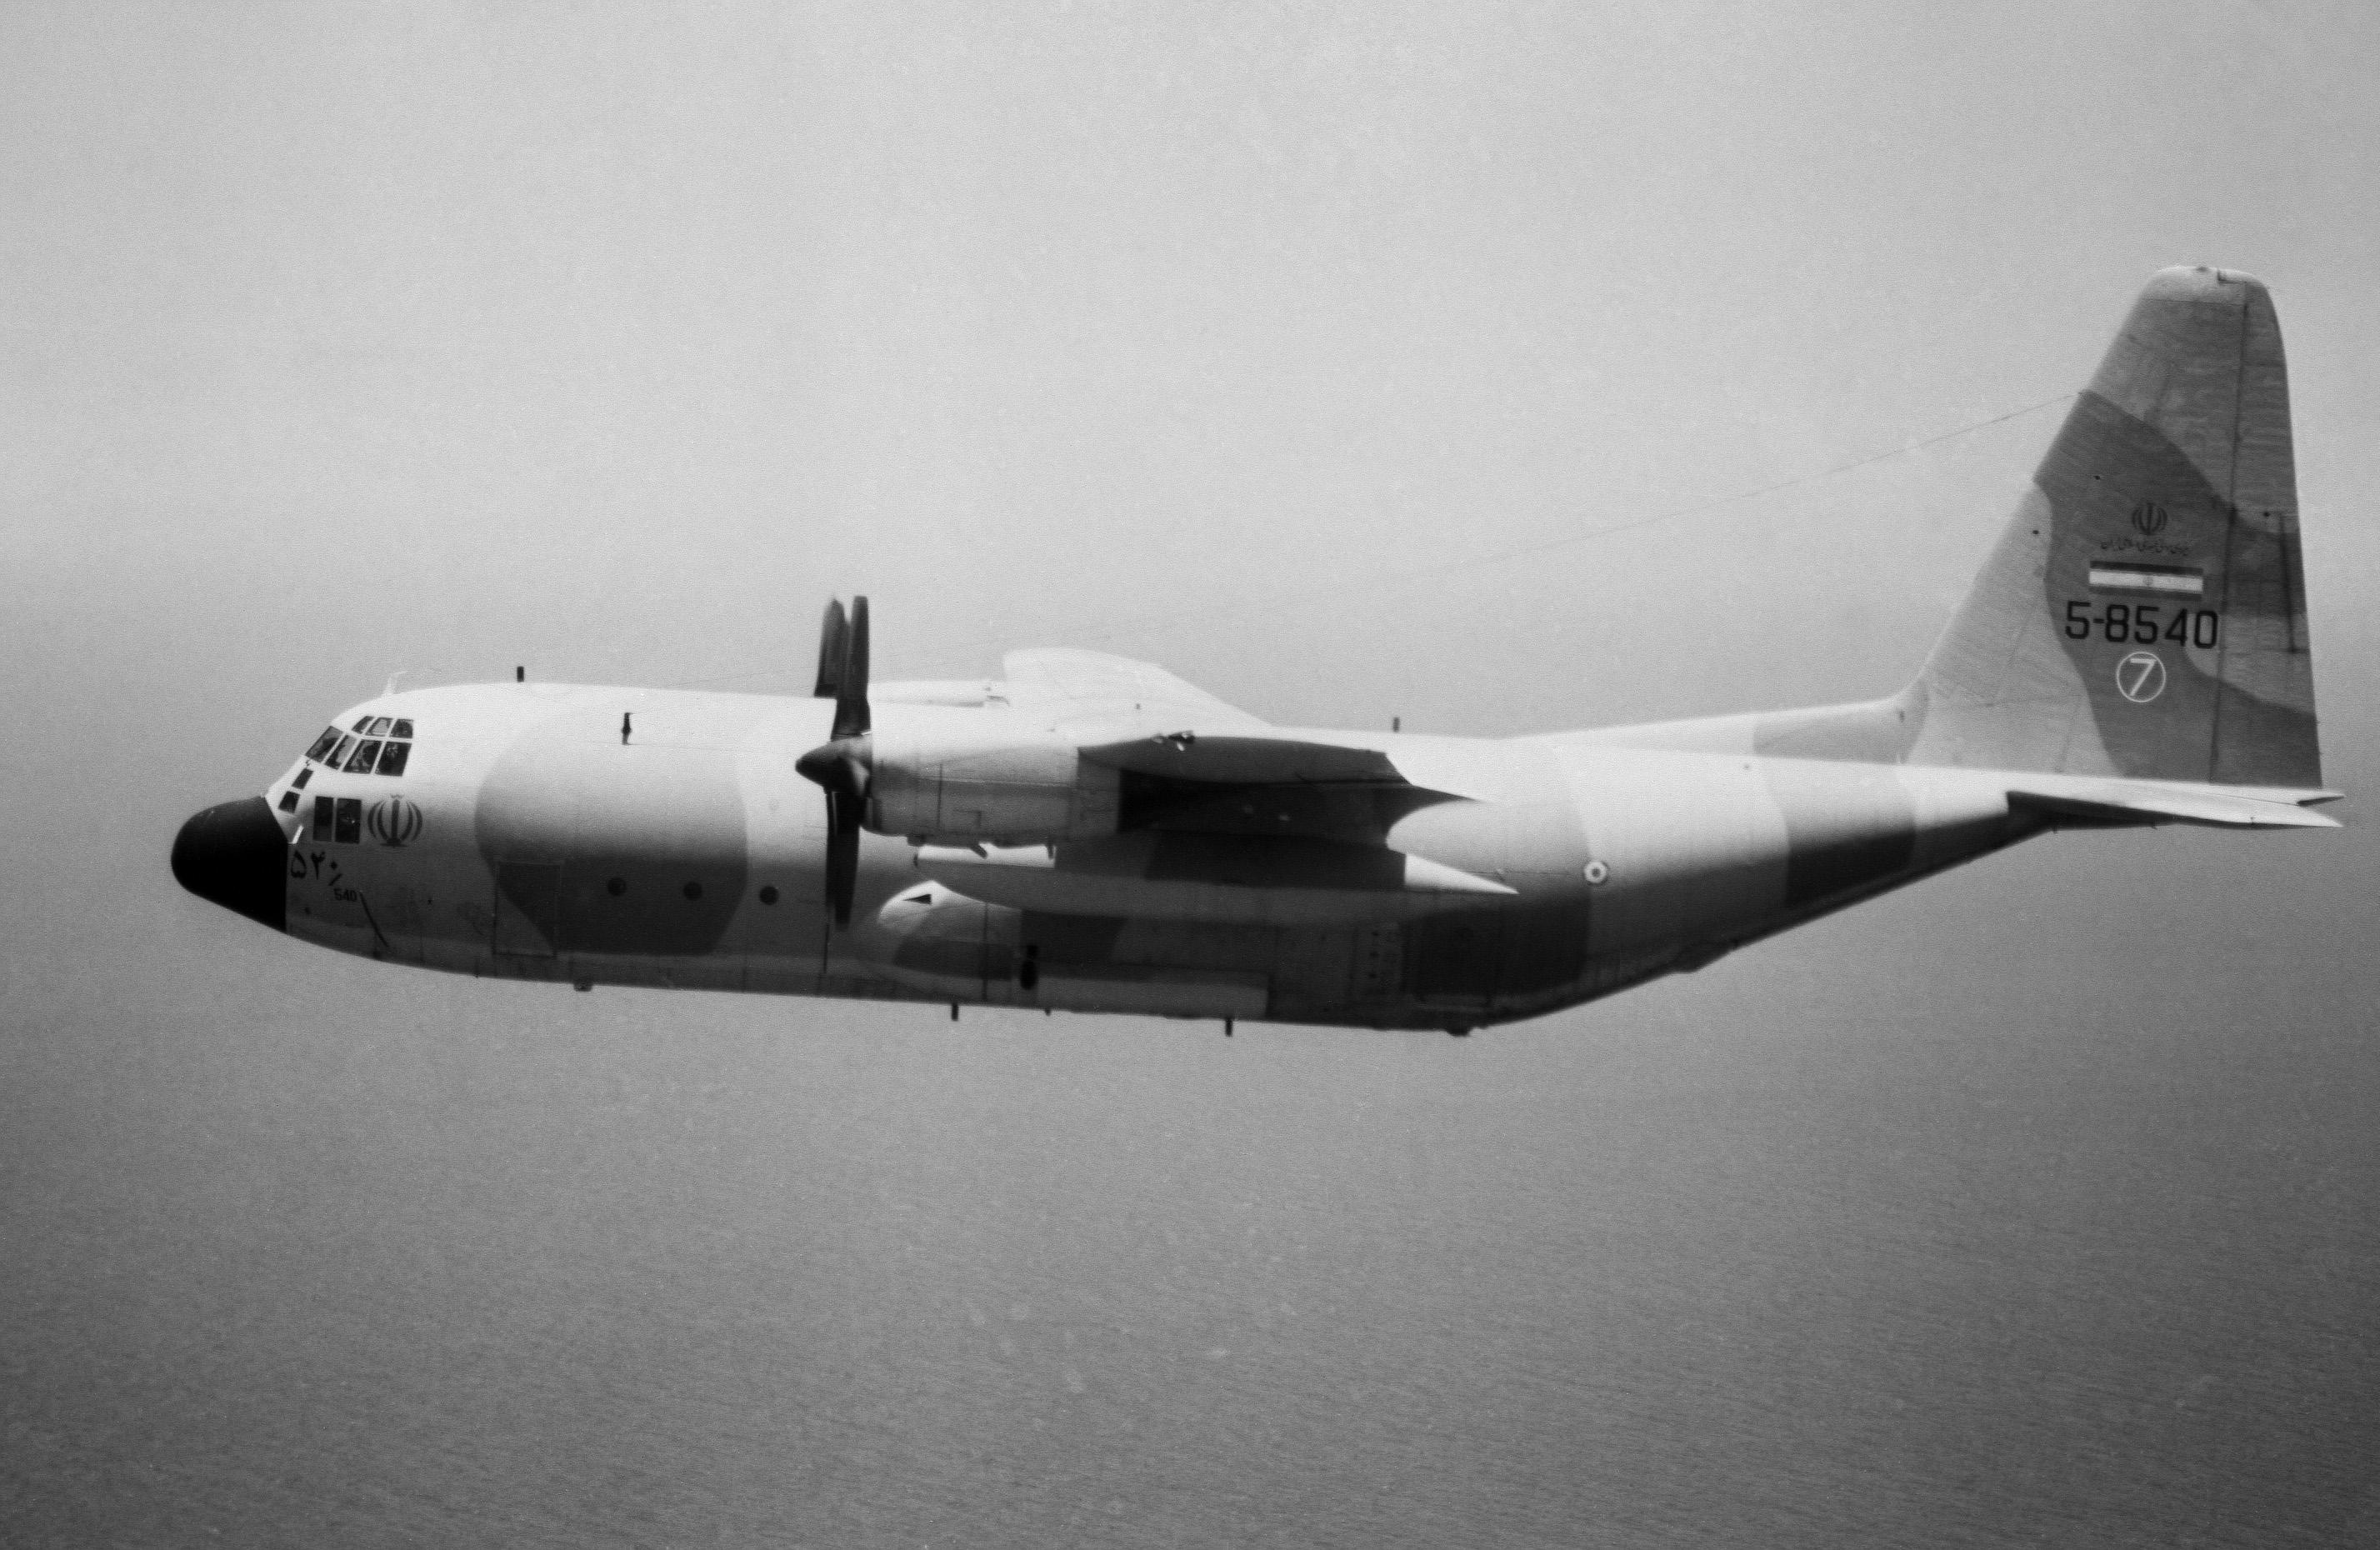 2005 Iranian Air Force C 130 crash Wikipedia